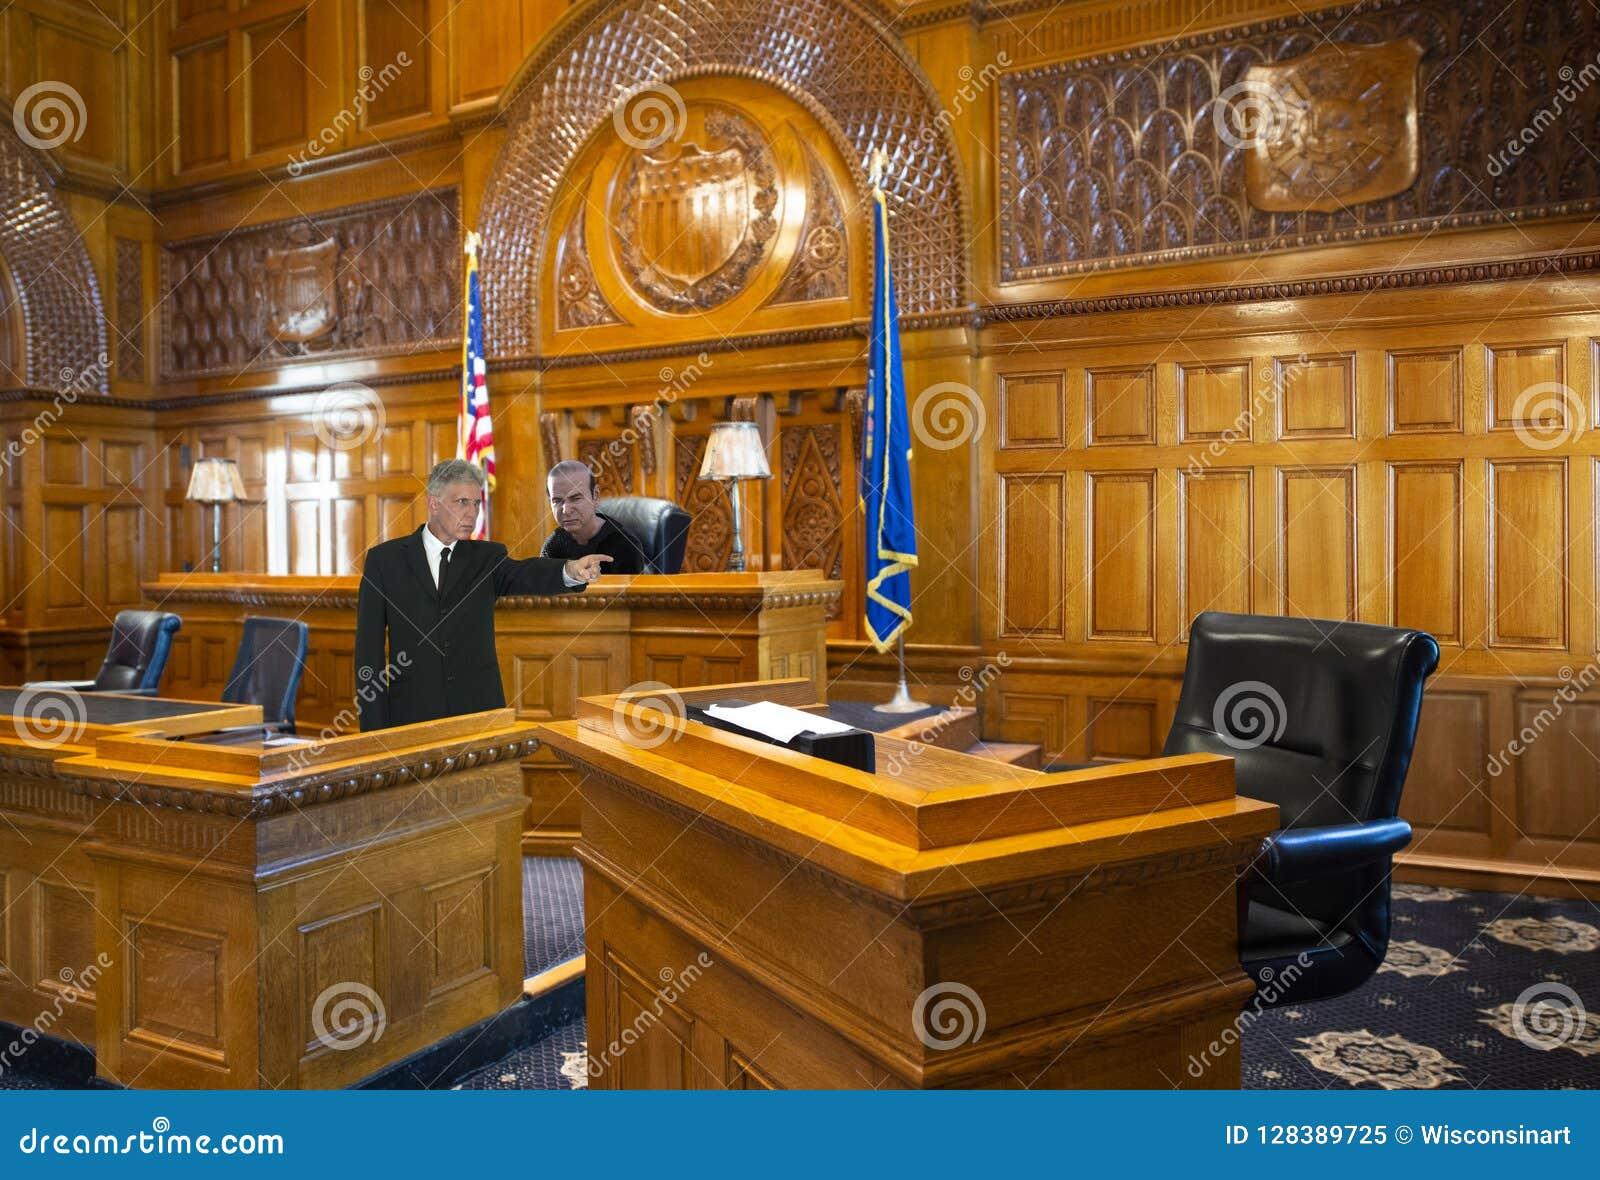 Gerichtssaal-Schablone, Zeugenstand, Gesetz, Rechtsanwalt, Richter